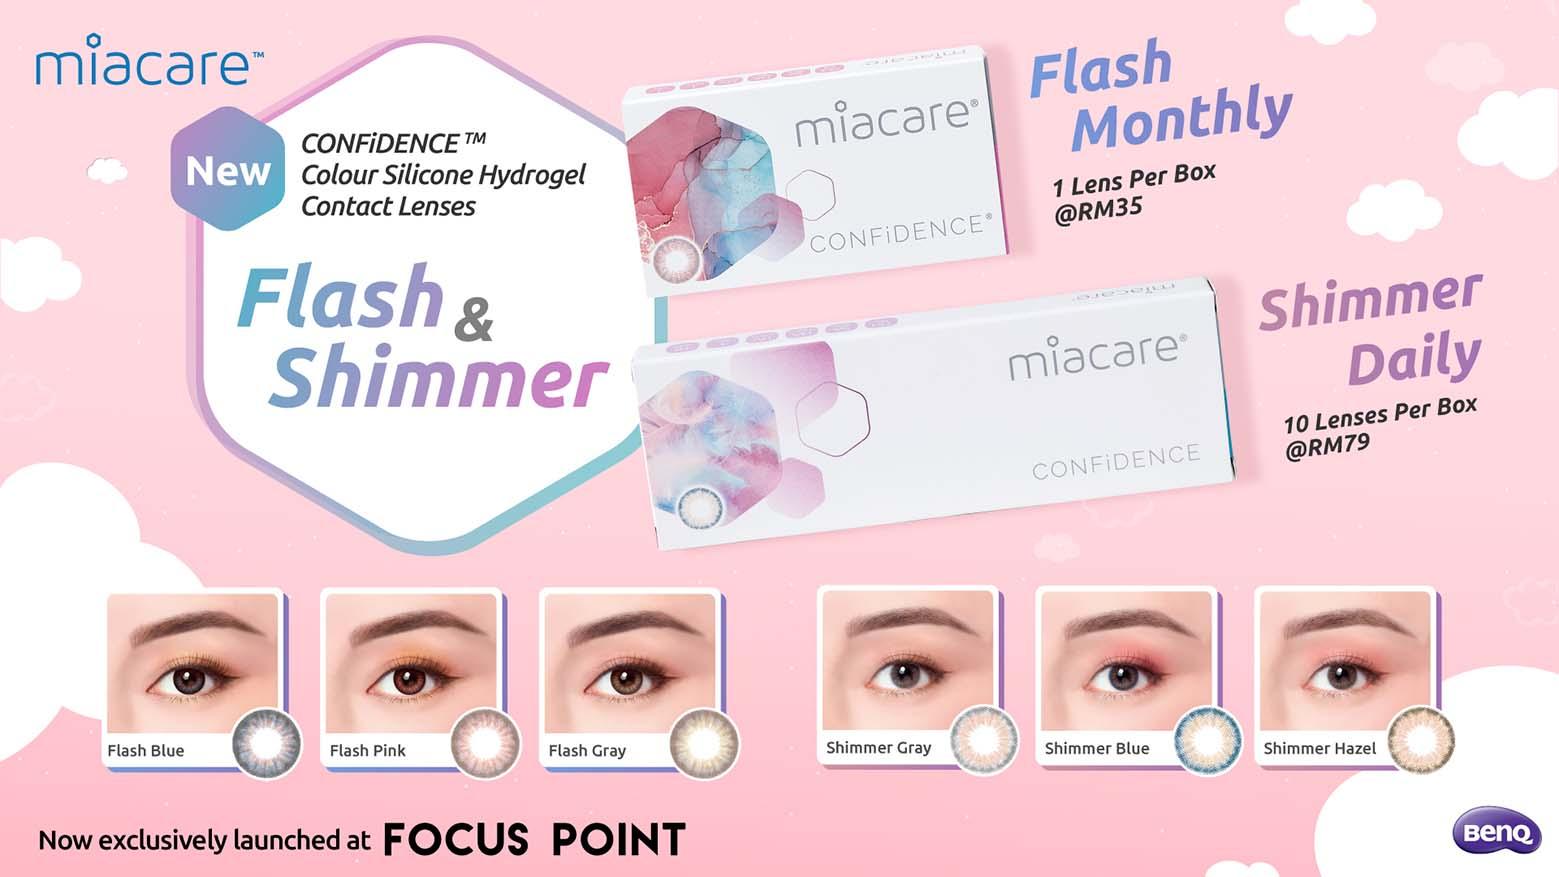 Miacare's CONFiDENCE™ Flash & Shimmer Colour Contact Lenses